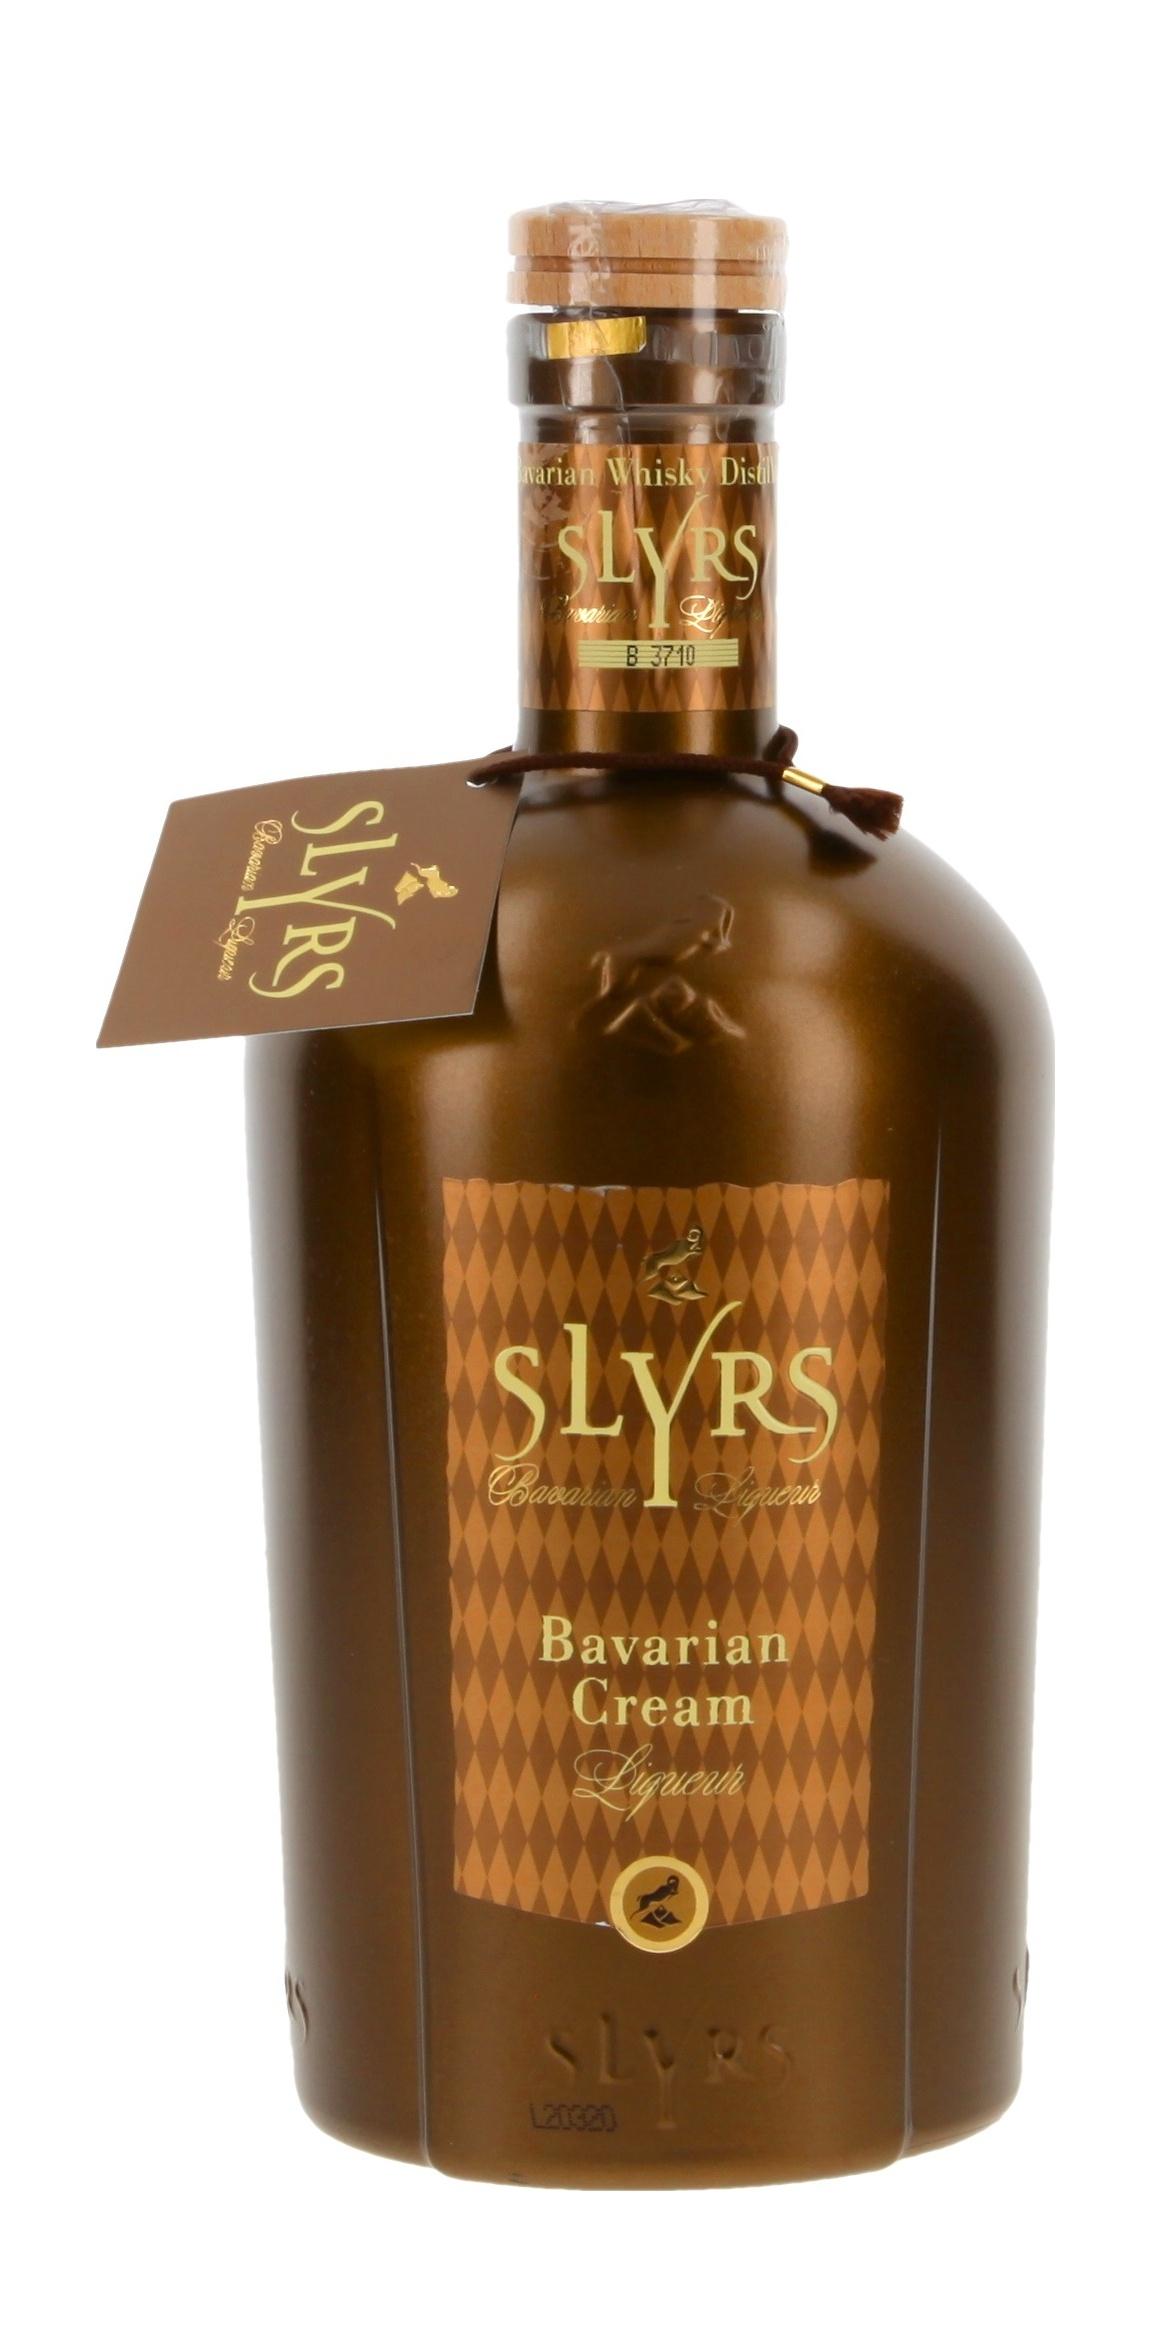 Slyrs Likör Bavarian Cream